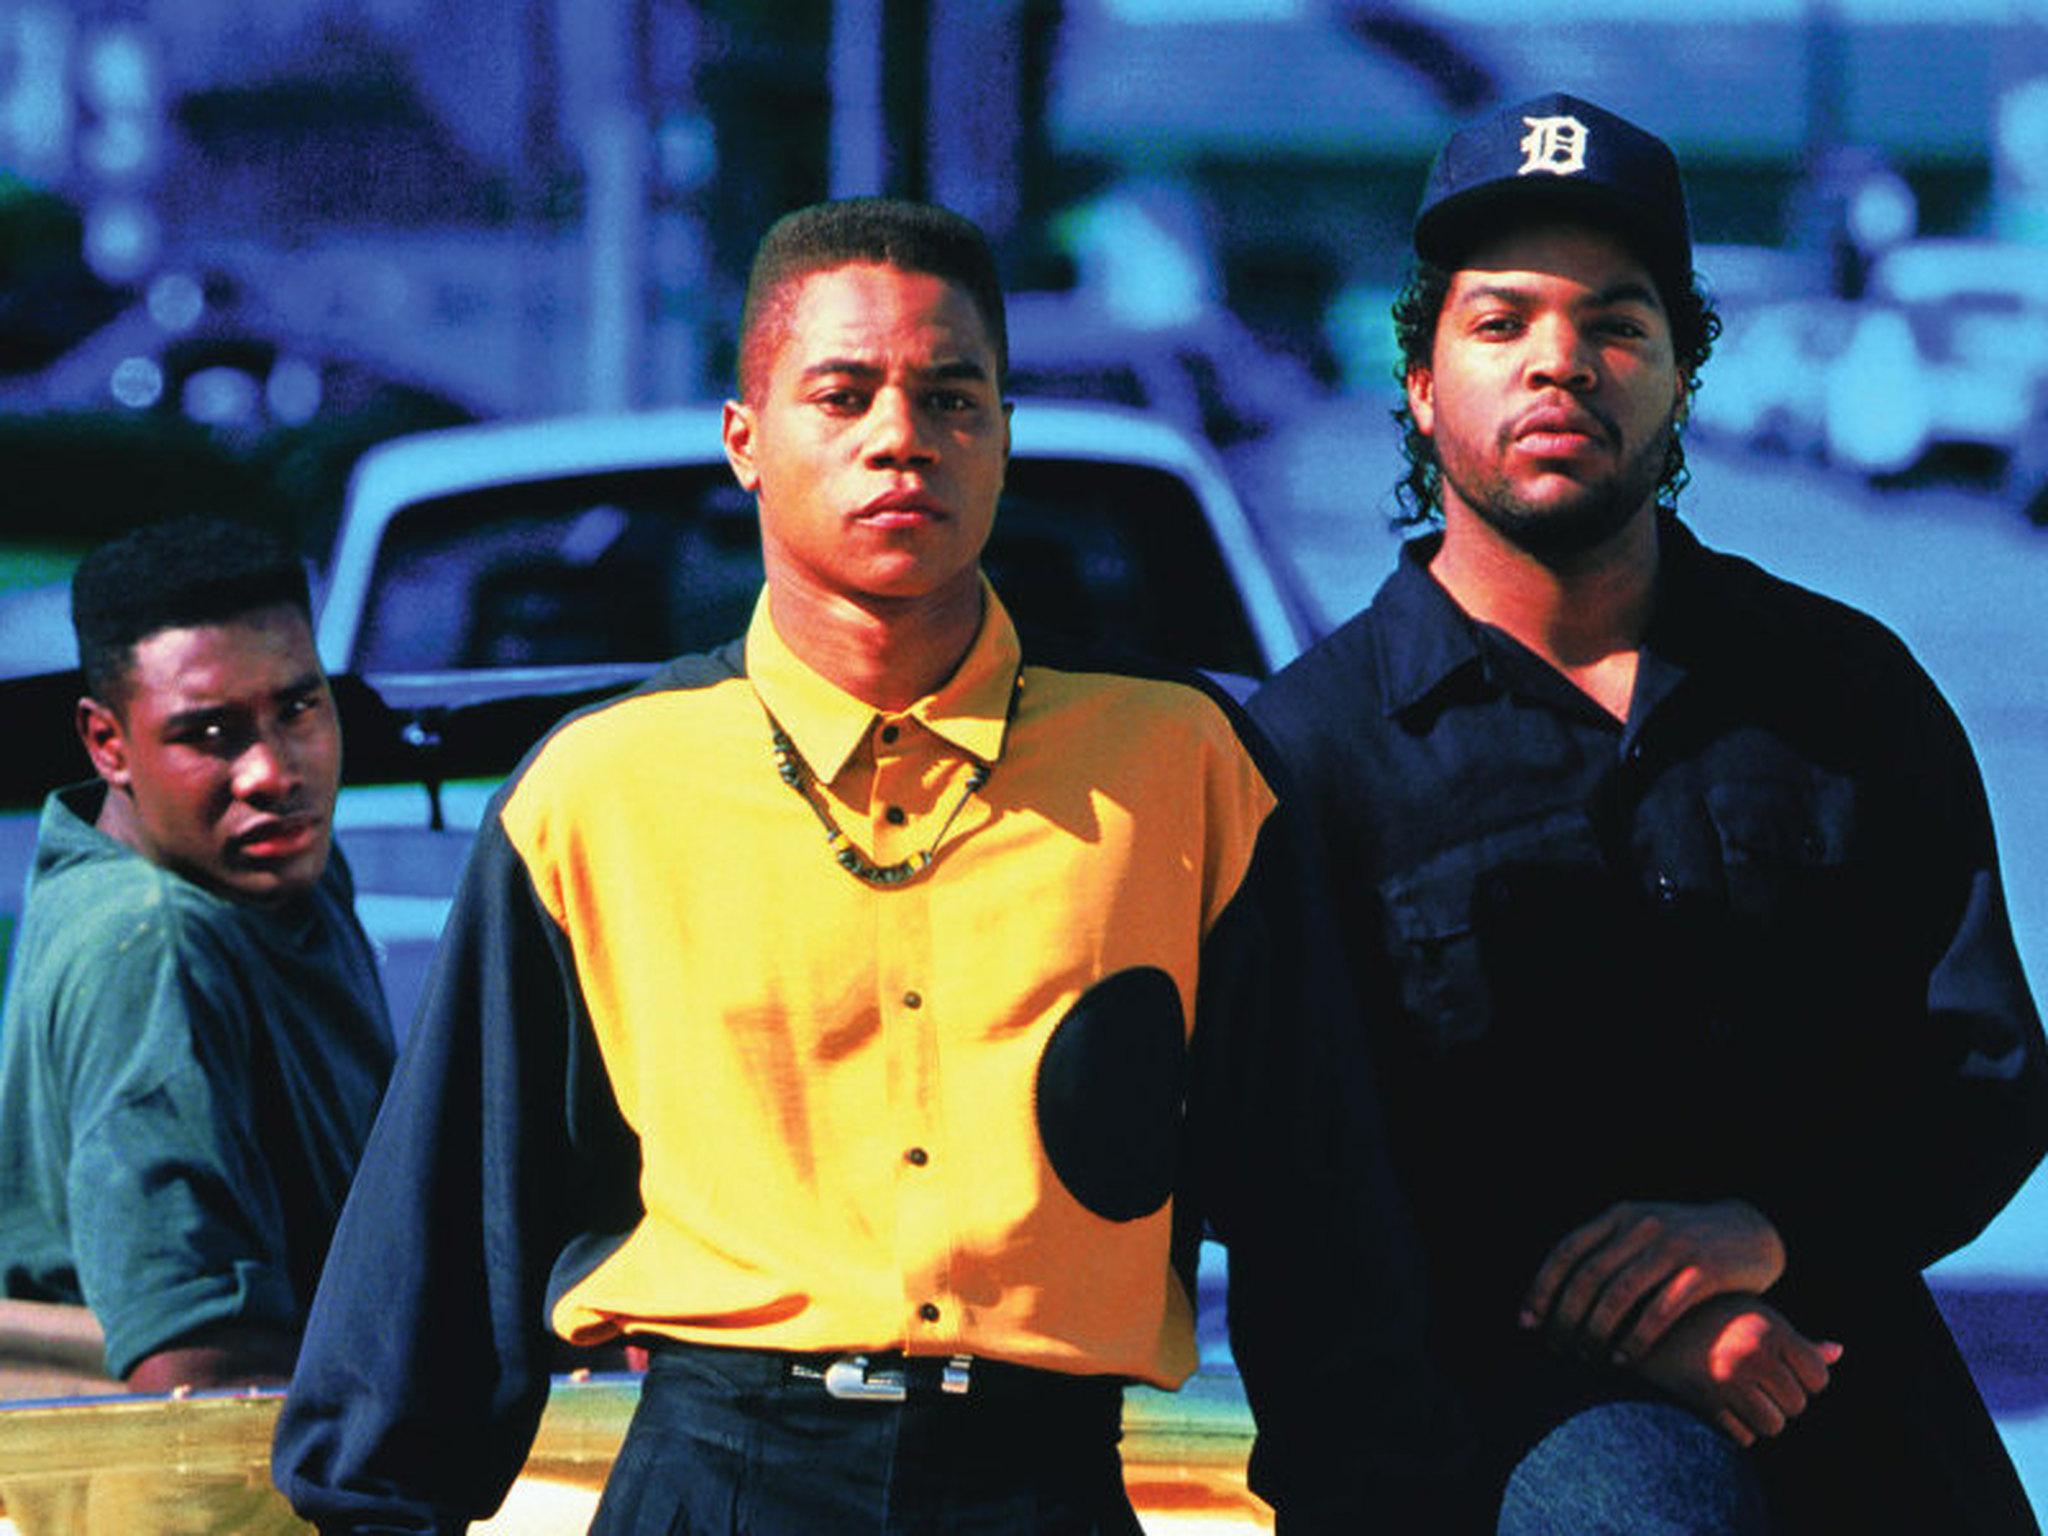 Boyz n the Hood - Strade violente: Cuba Gooding Jr. e Ice Cube